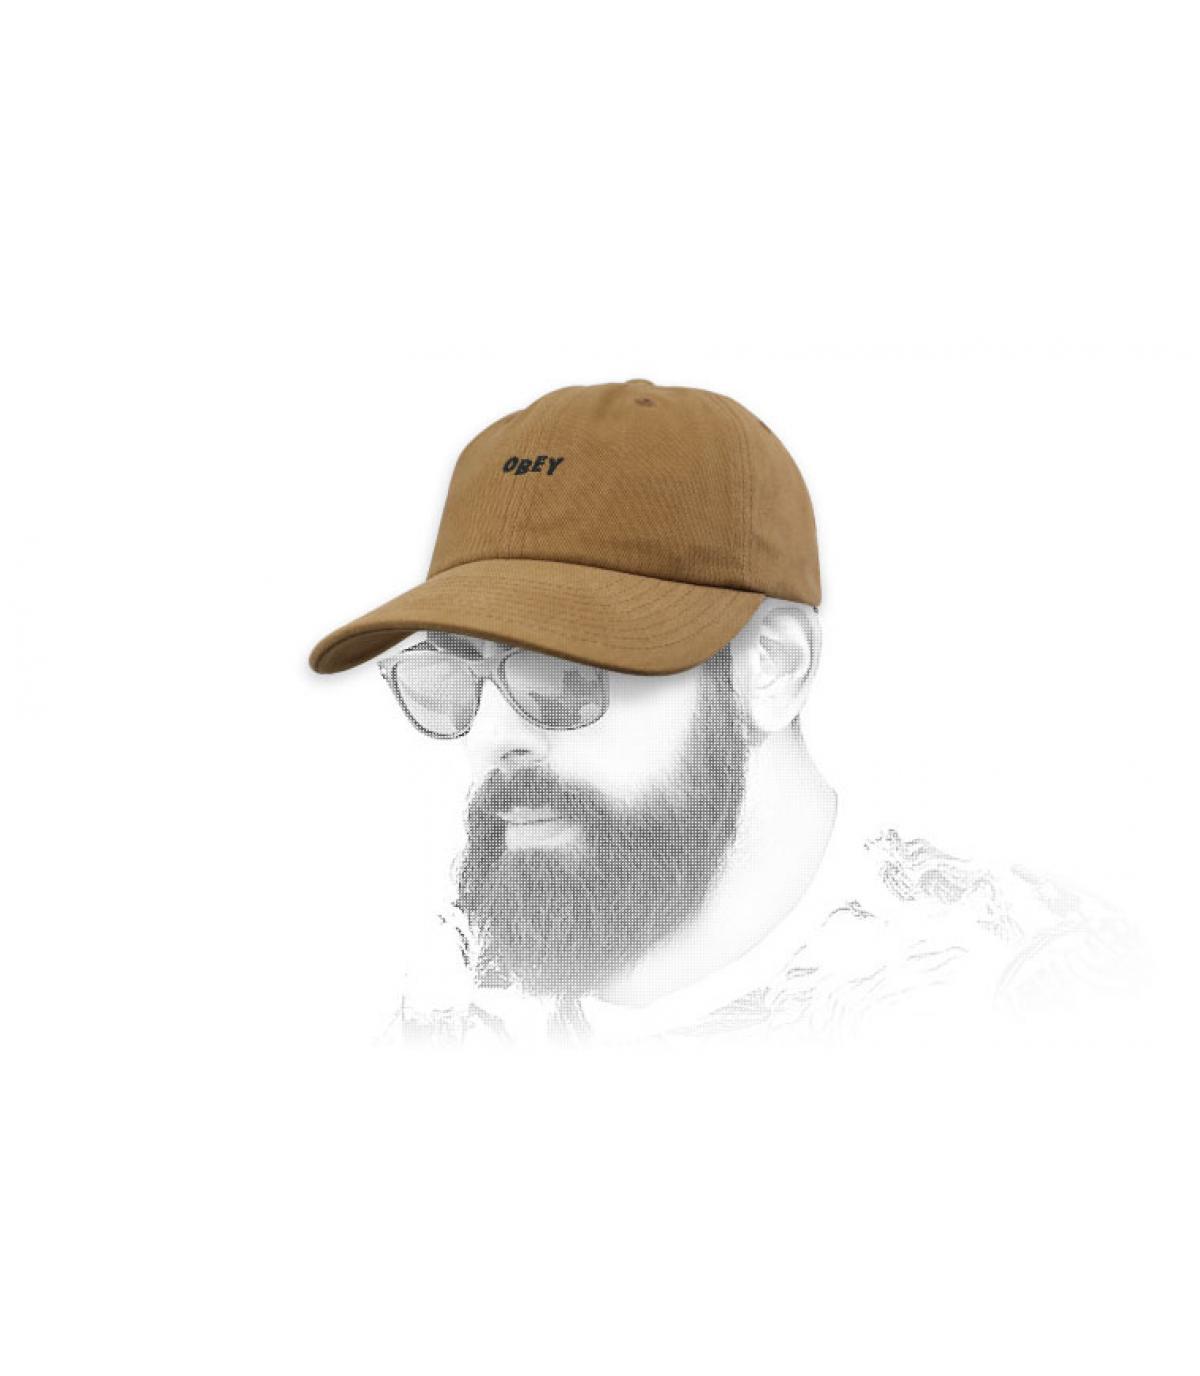 Obey brown curve cap